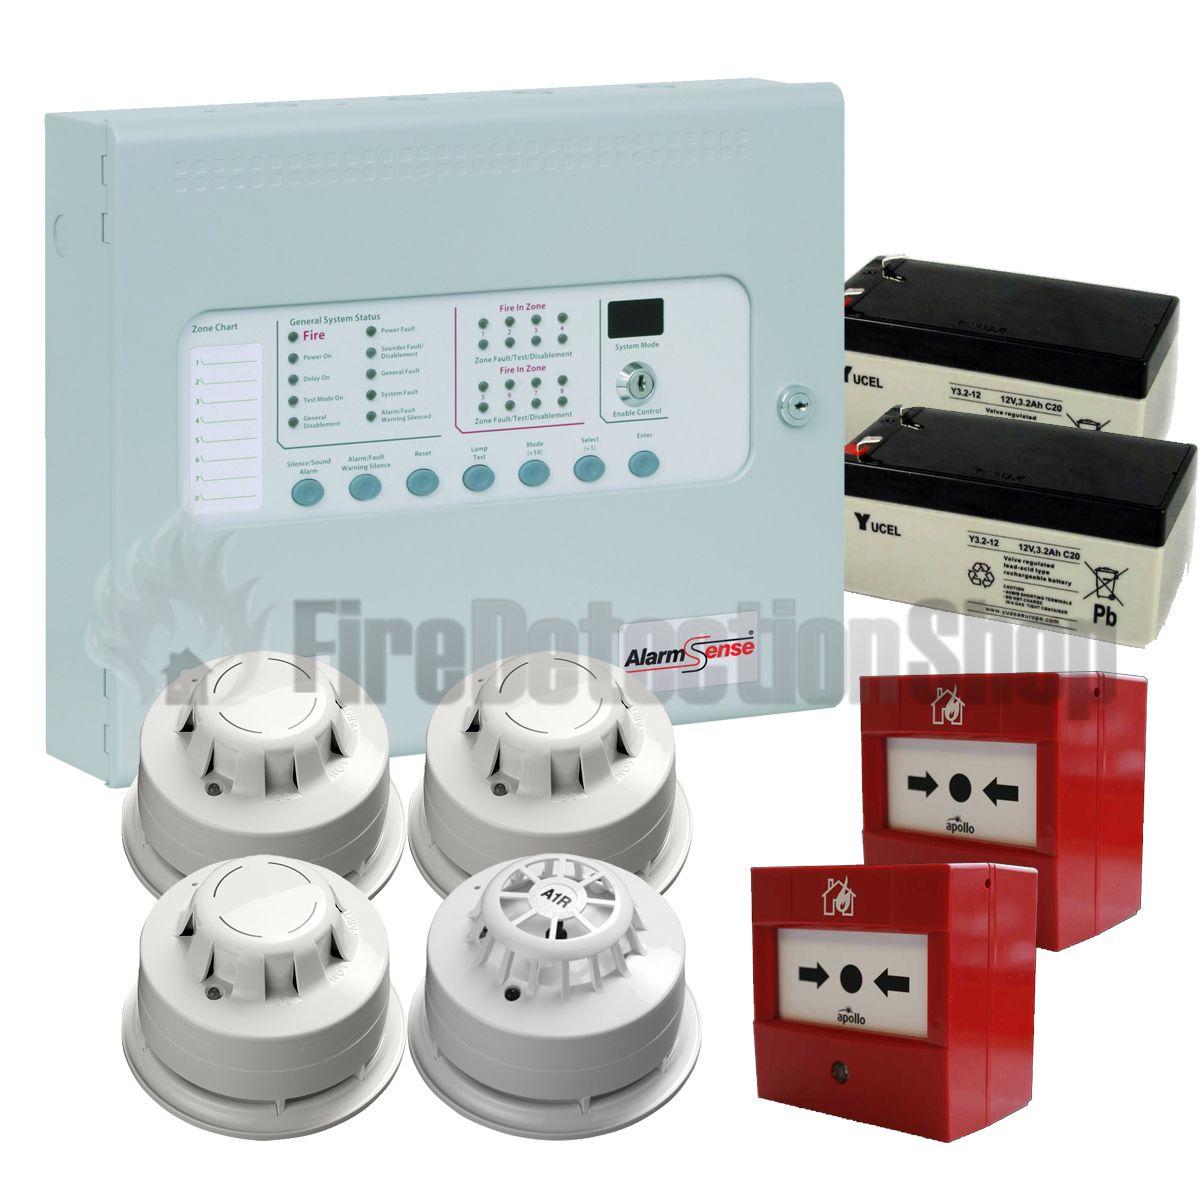 Kentec 2 Zone Alarmsense Bi-Wire Fire Alarm Kit